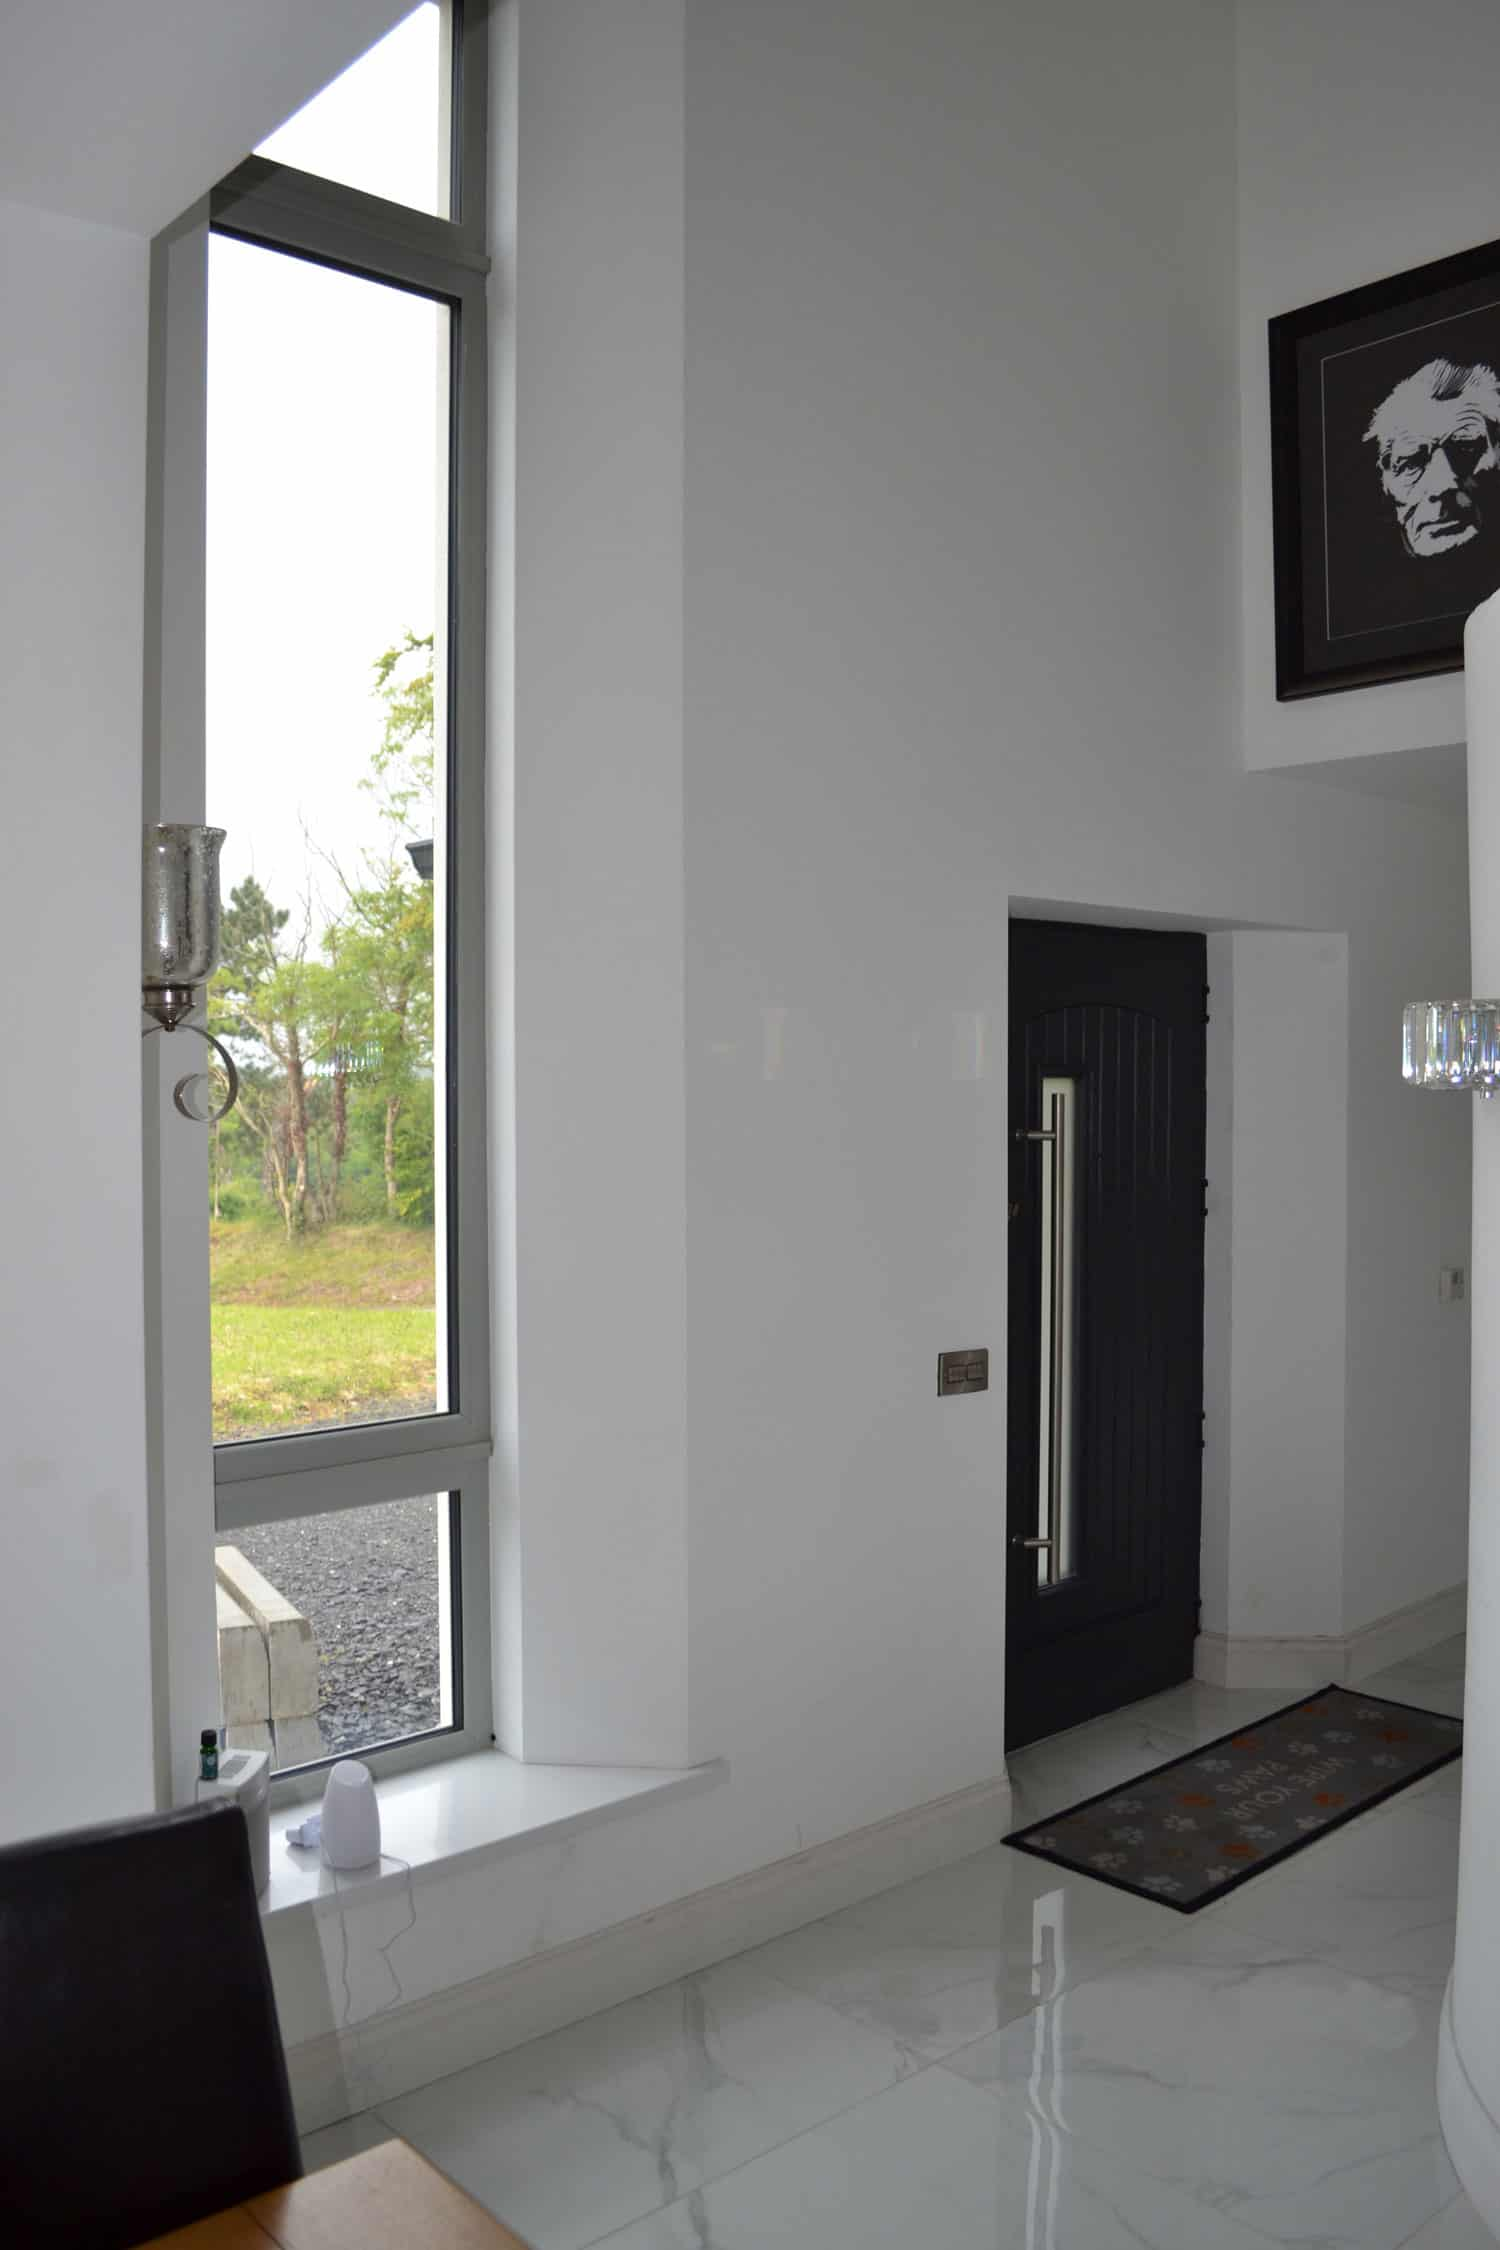 Fleming Dwelling - Main Entrance Door & Feature Window into Hallway